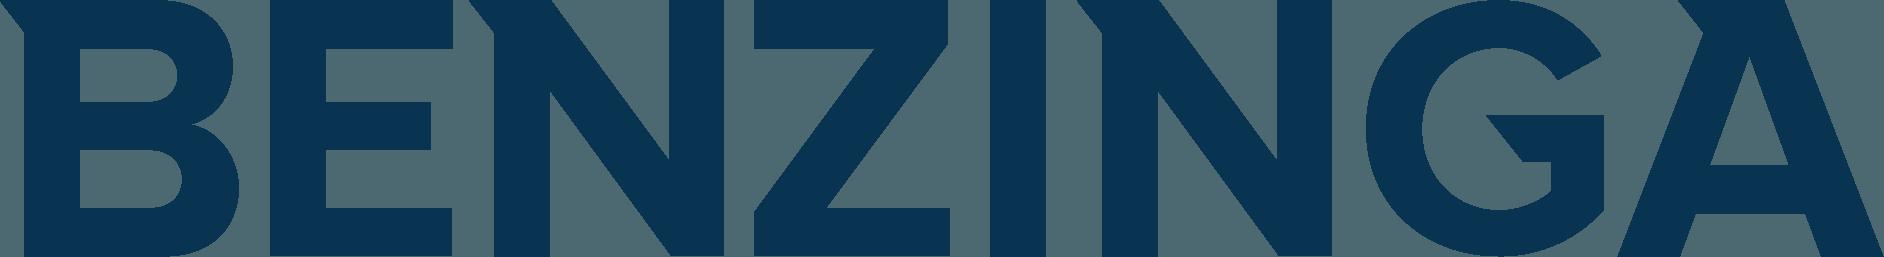 logo for benzina